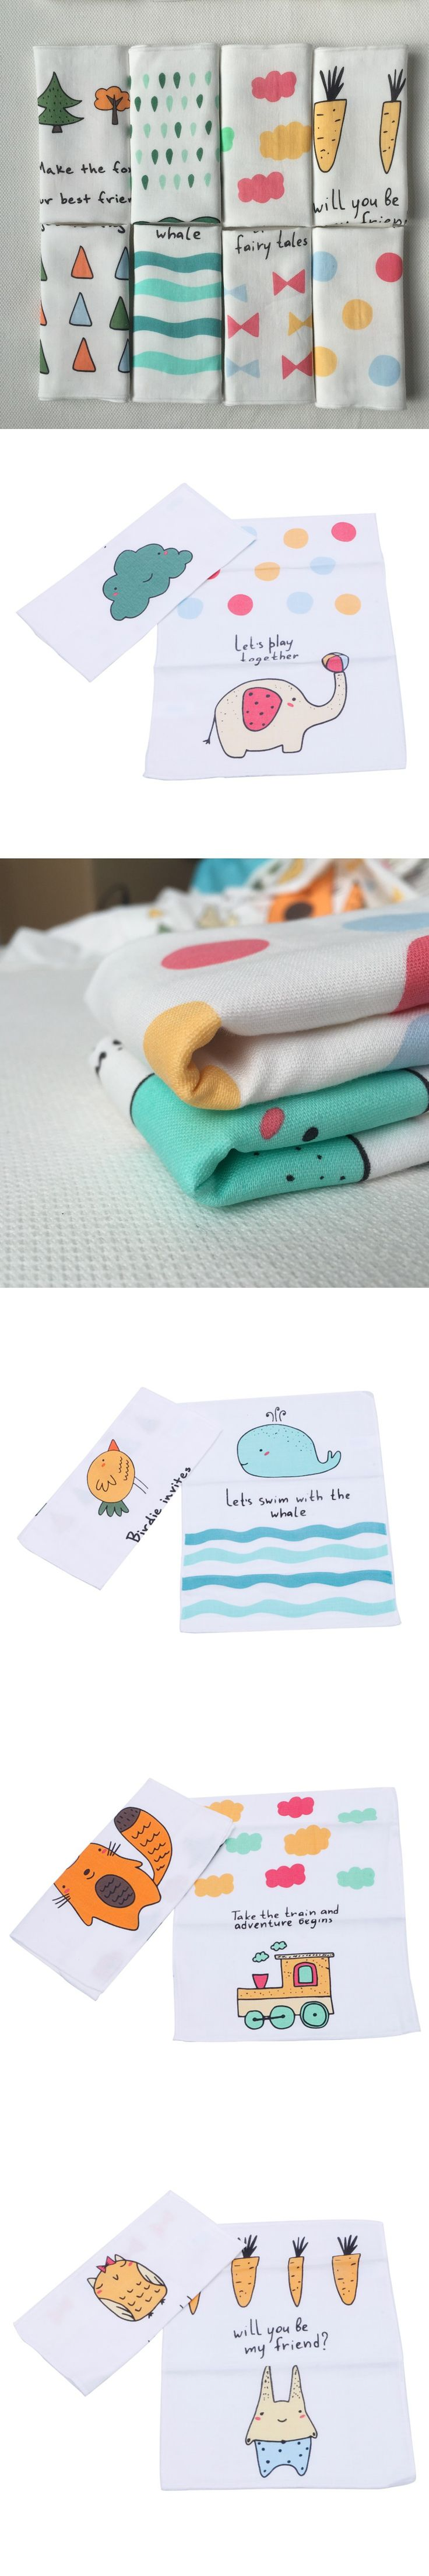 2Pcs Newborn Soft Saliva Nursing Feeding Towel Baby 100% Cotton Handkerchief $2.44